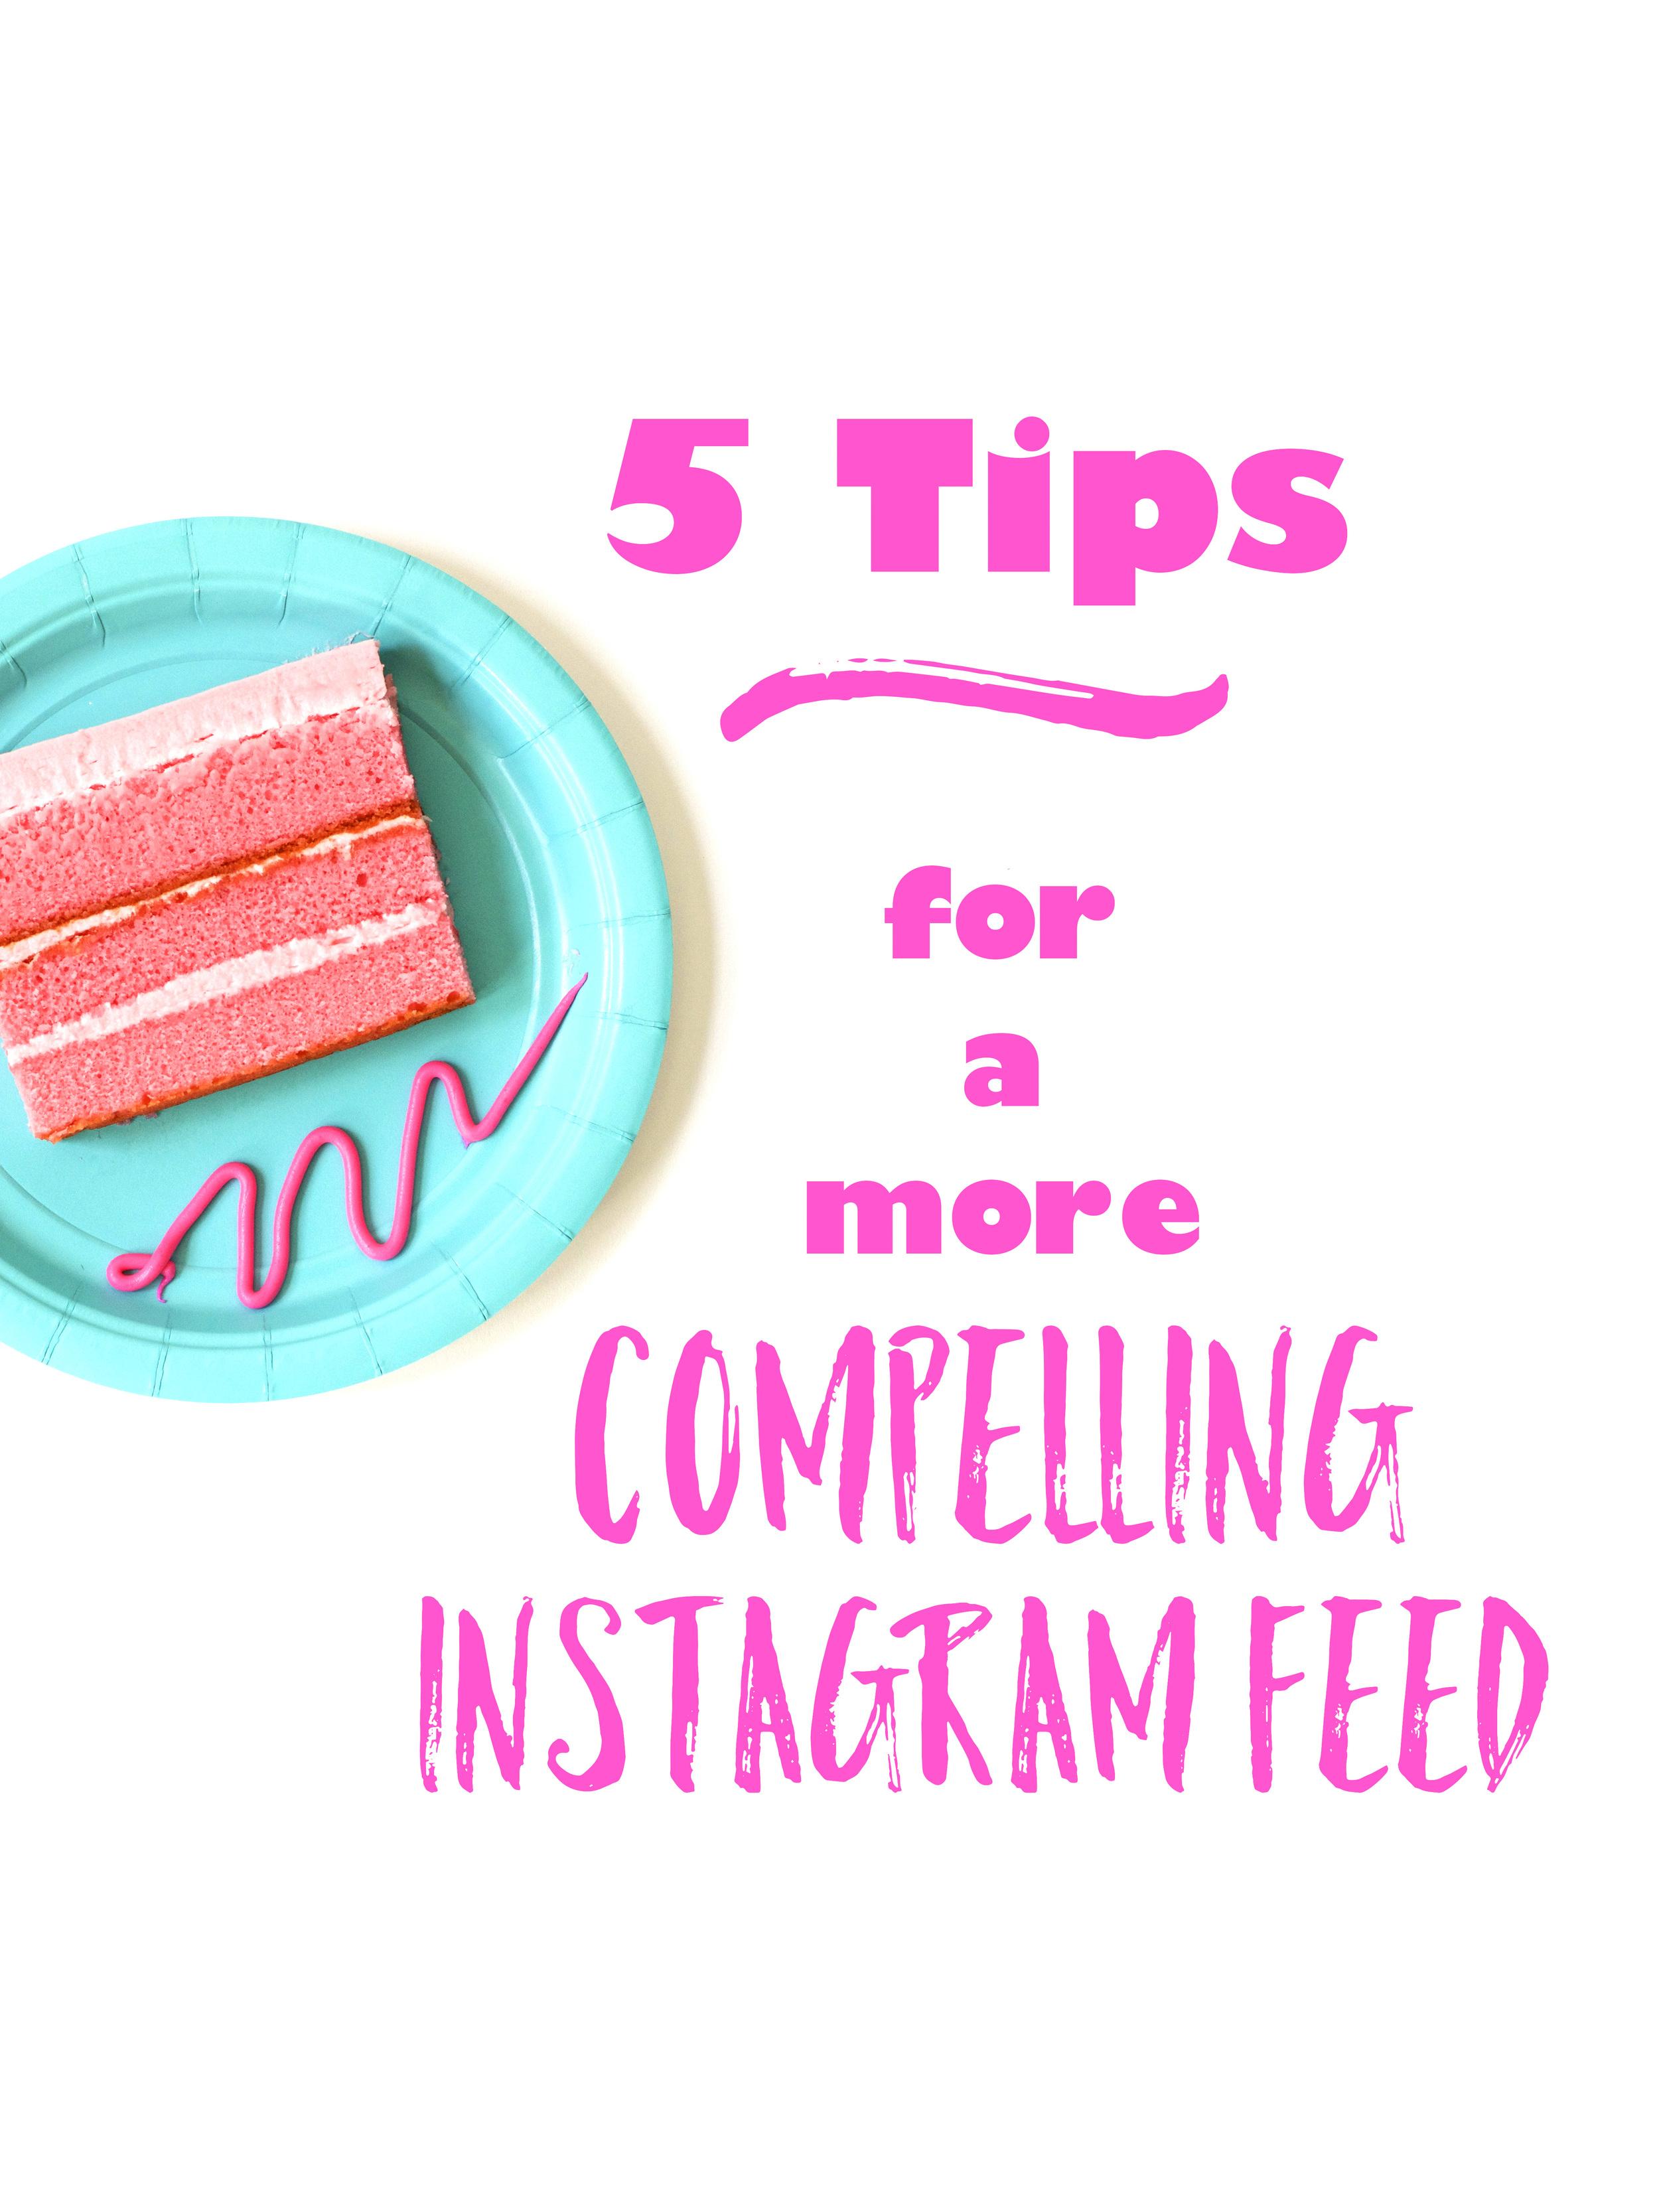 Violet Tinder Studios 5 Tips for a more compelling IG feed